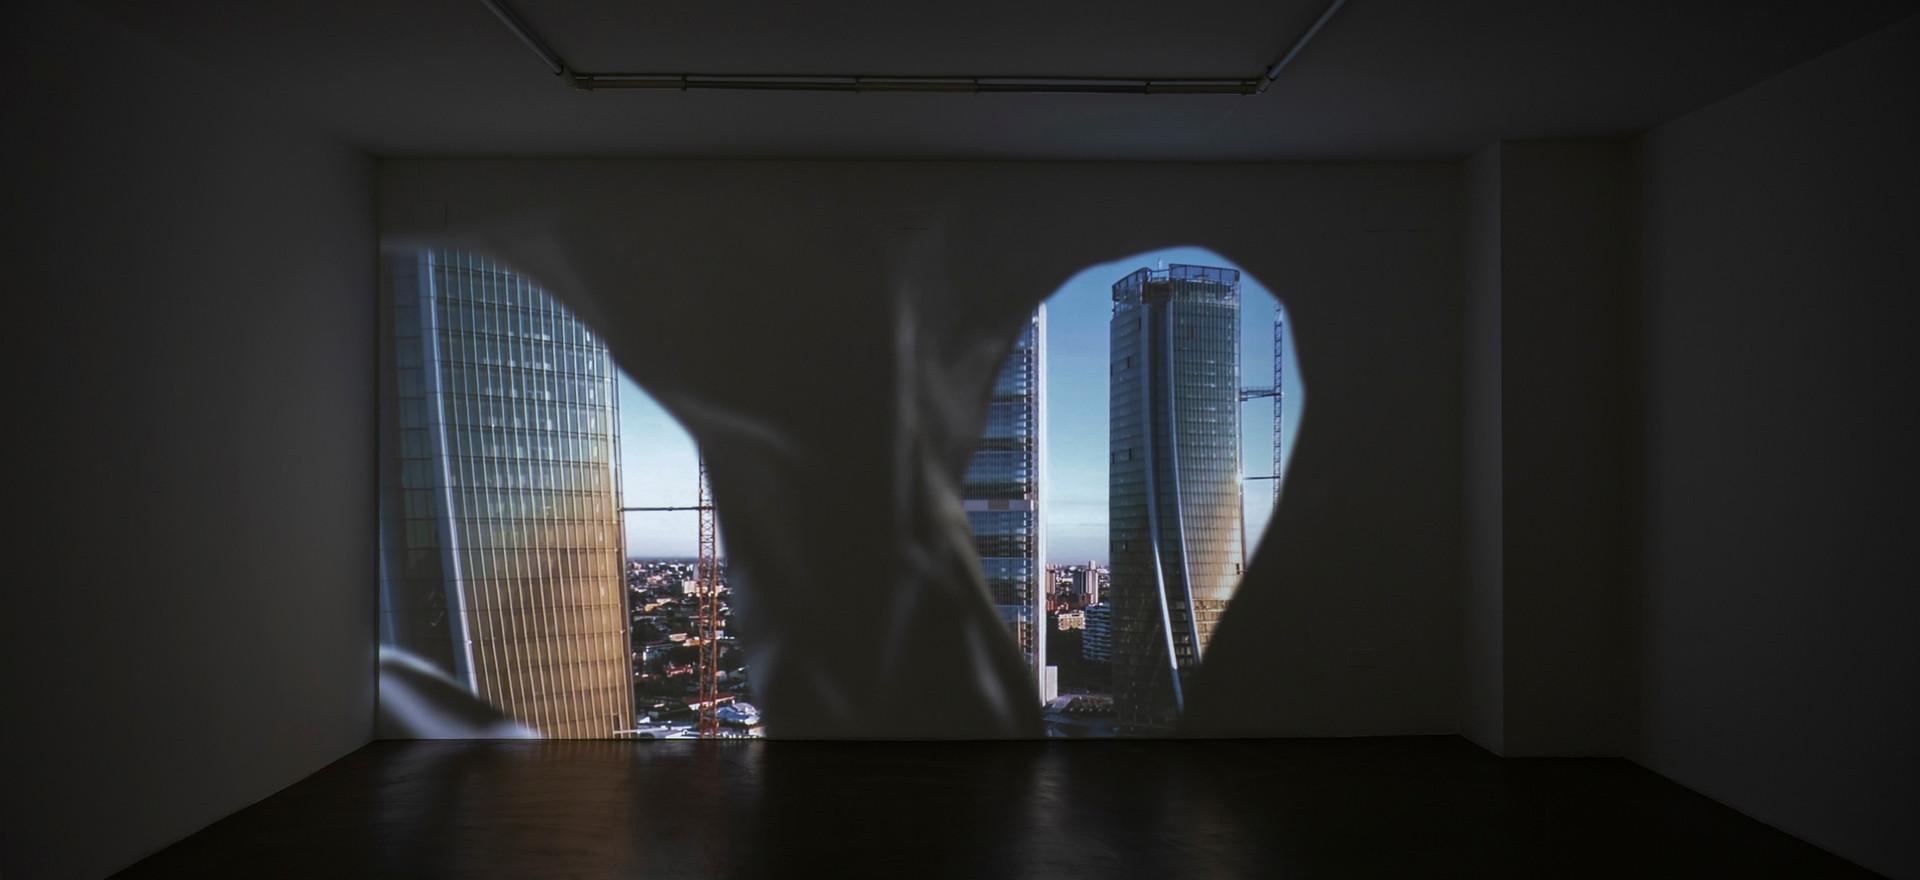 Devis Venturelli, Primitive Paradise, installation view